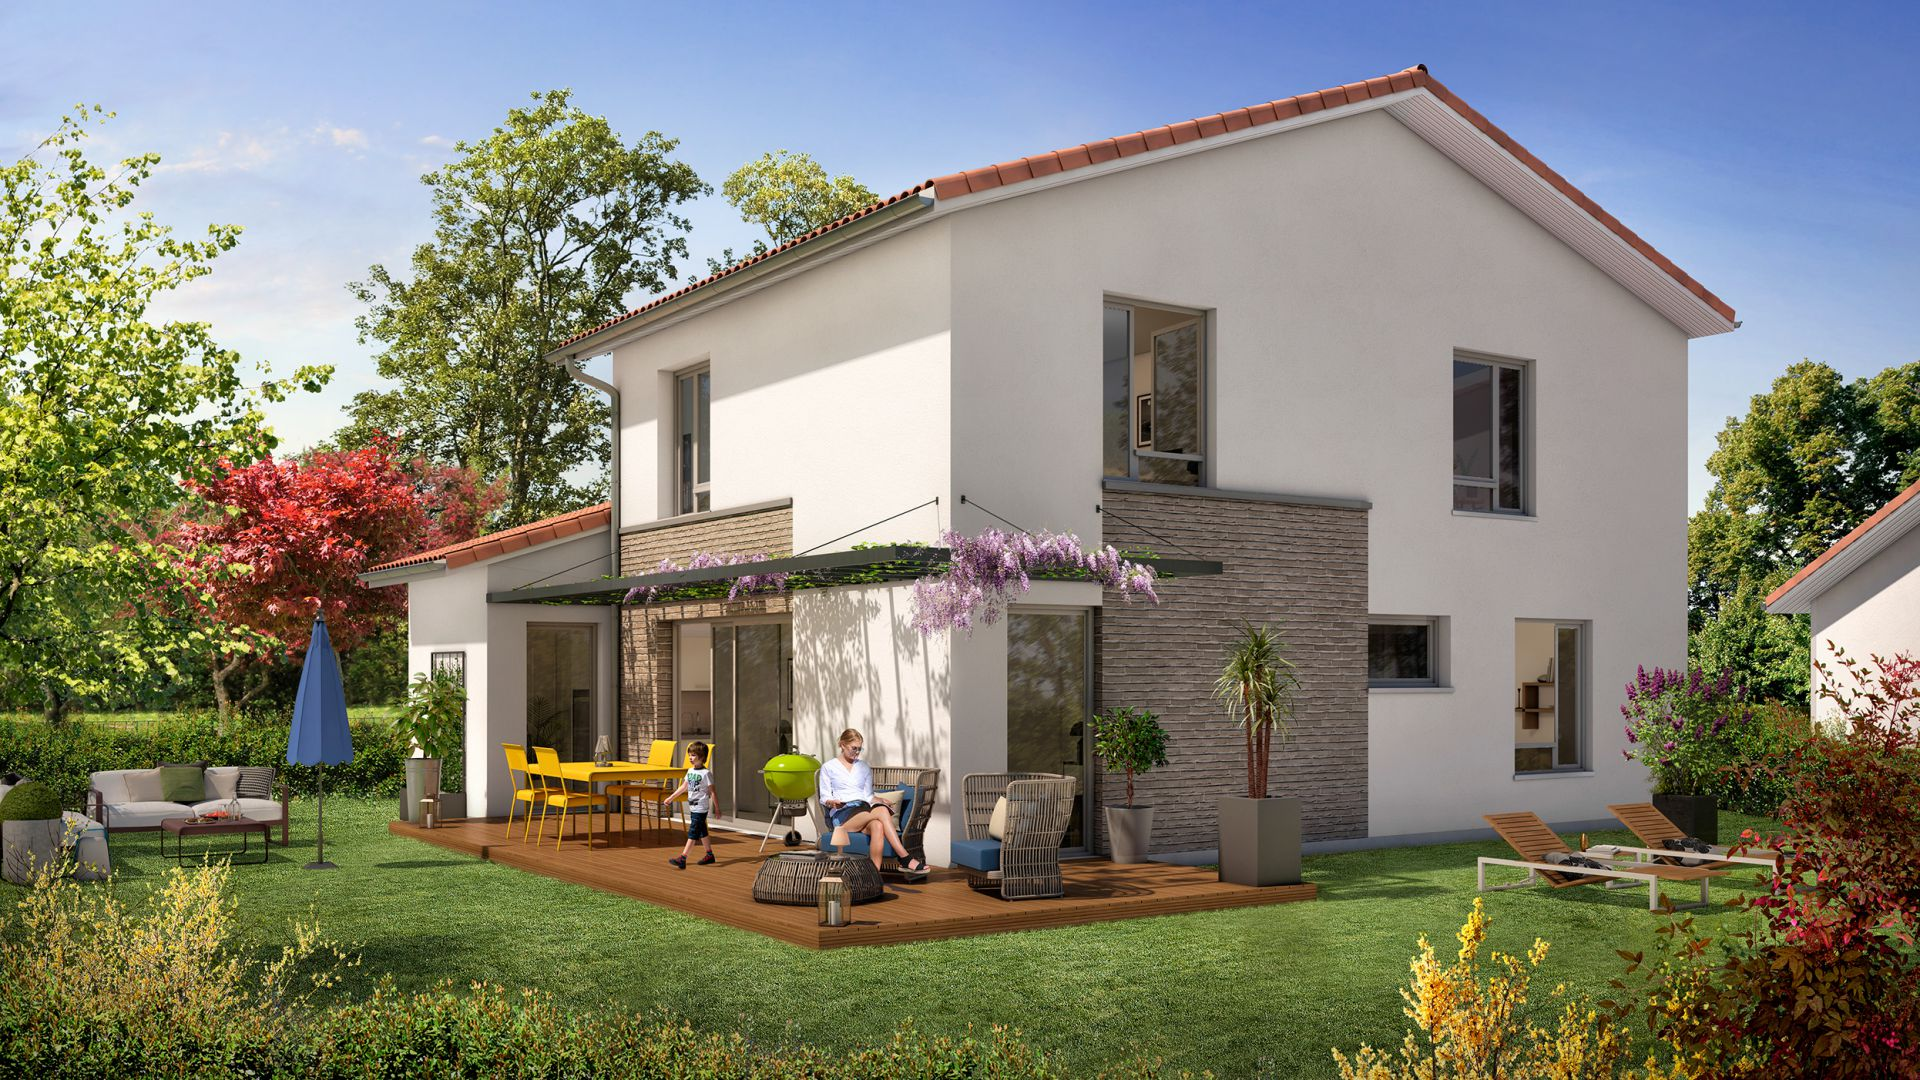 GreenCity Immobilier-La Bastide D'Adèle-Tournefeuille-31170-Villa T5